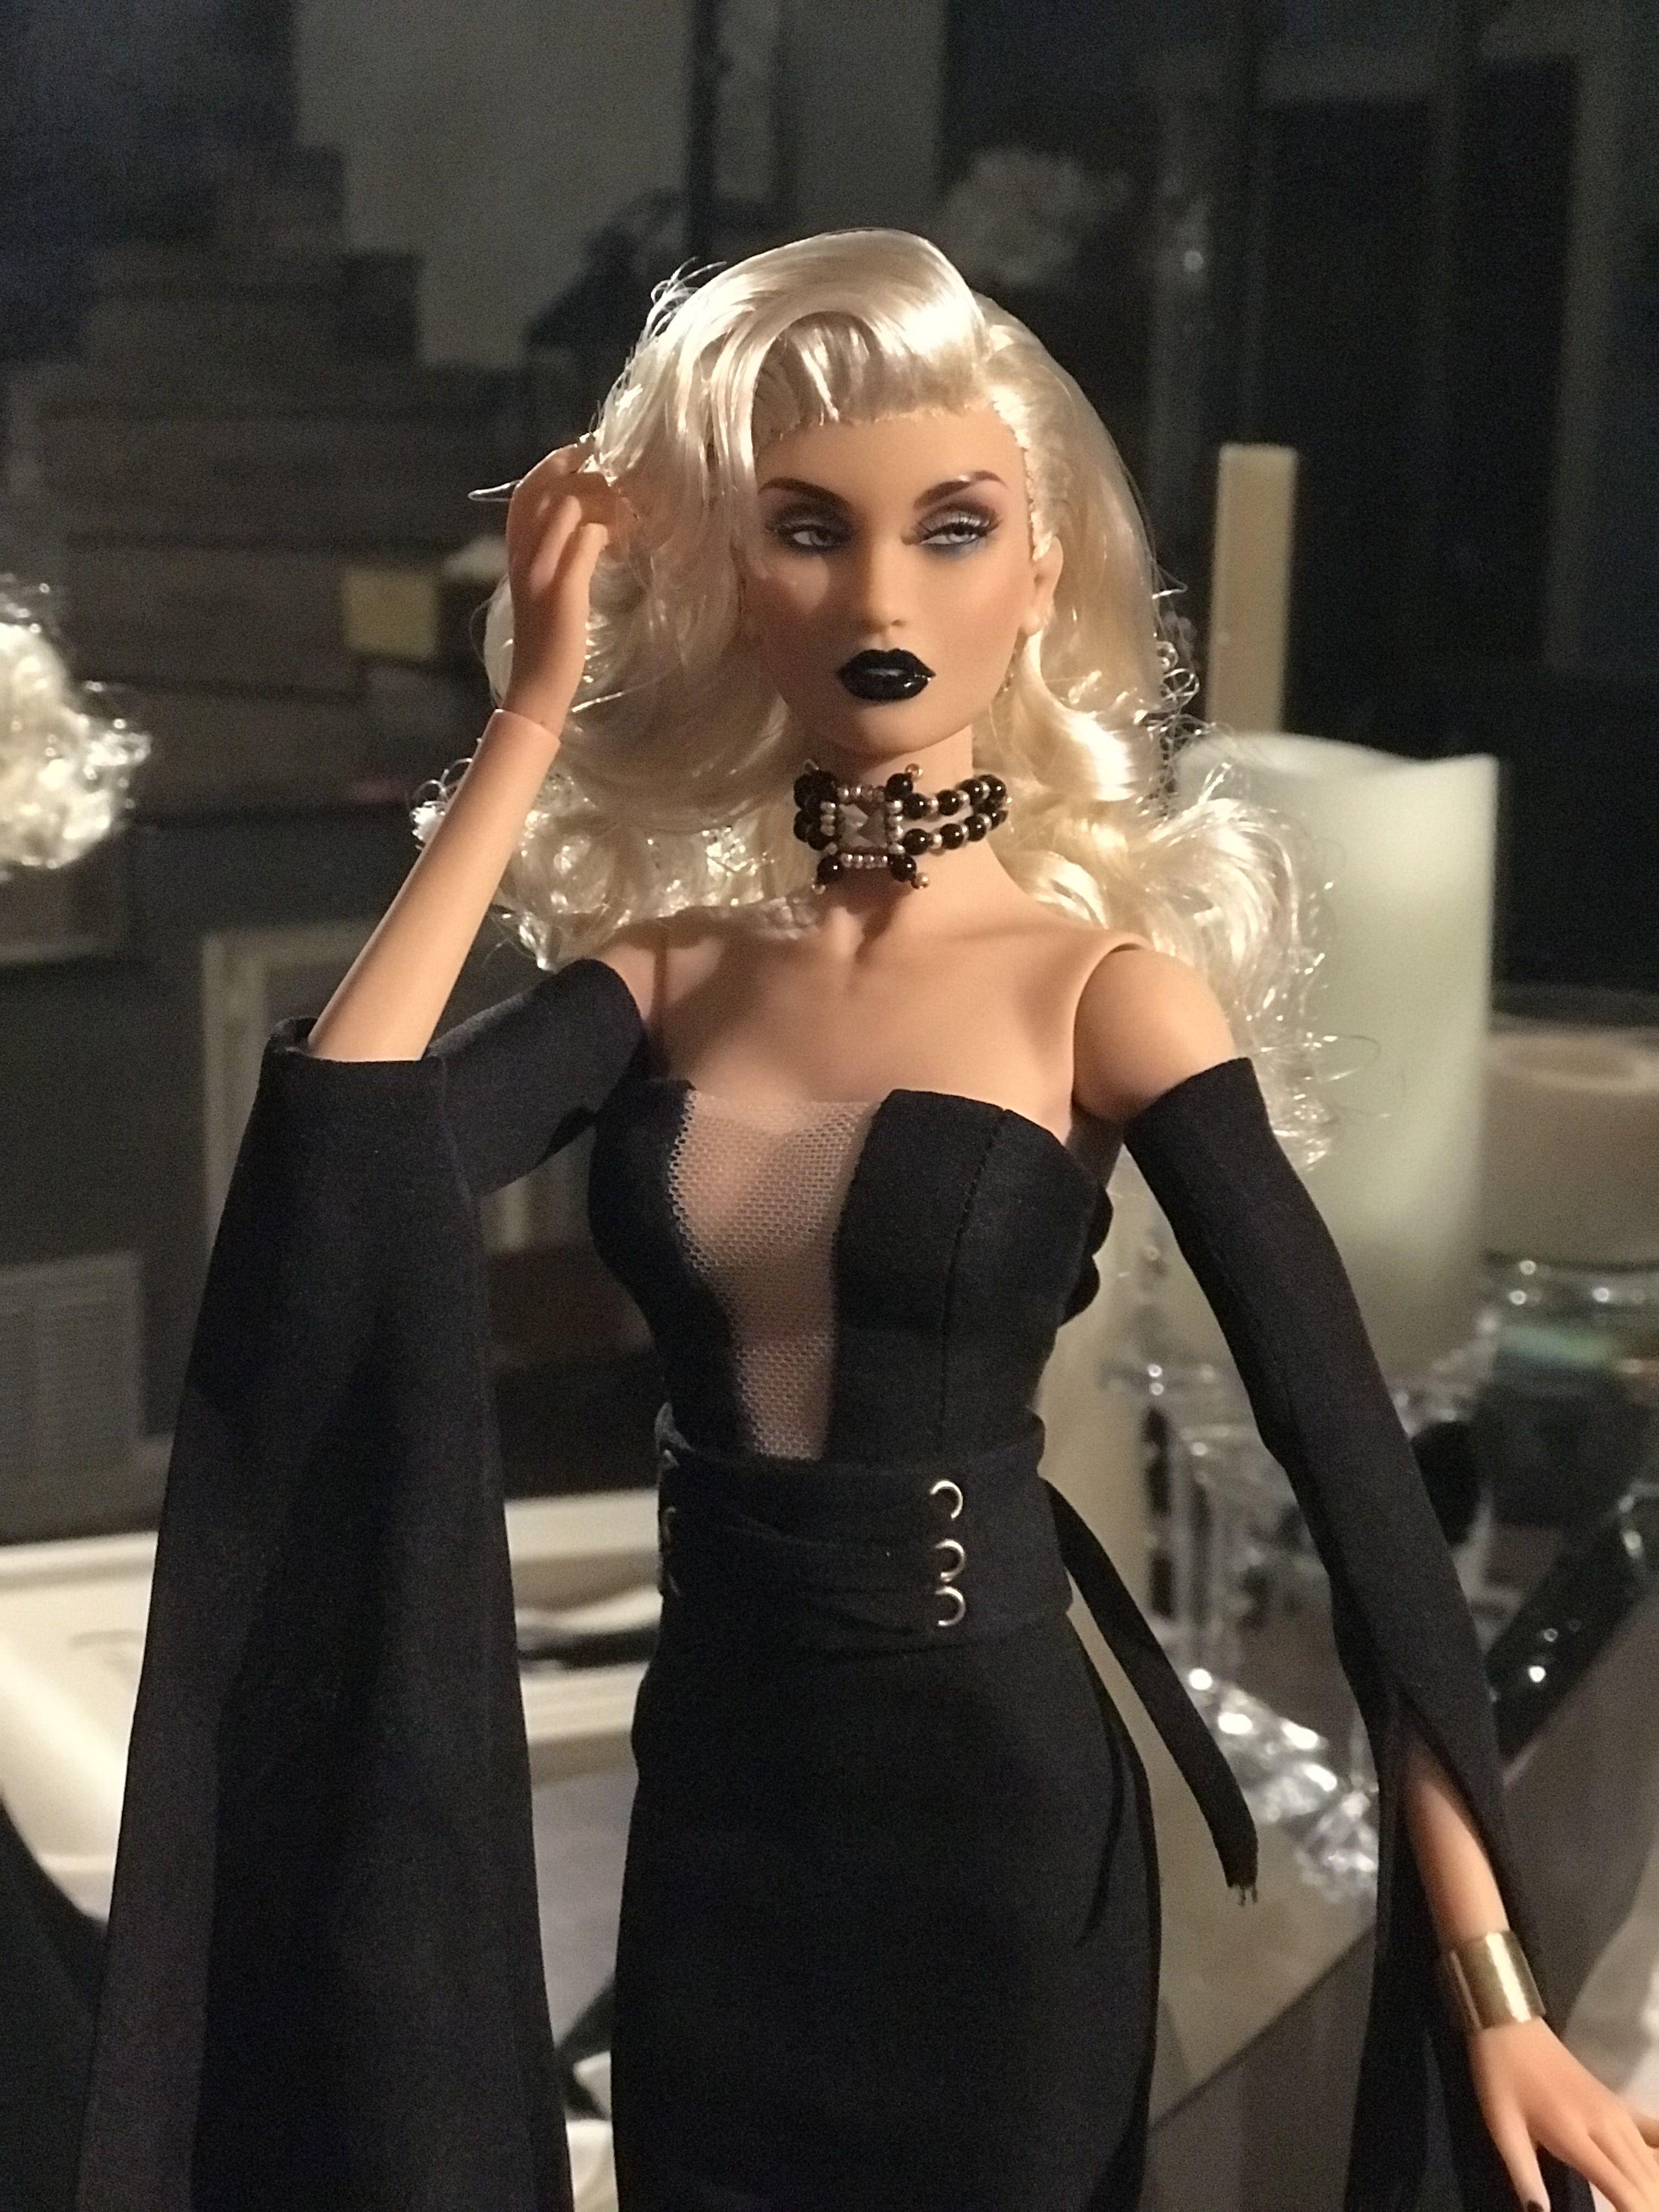 Ravenna The Black Queen Black Queen Fashion Cocktail Dress [ 4032 x 3024 Pixel ]